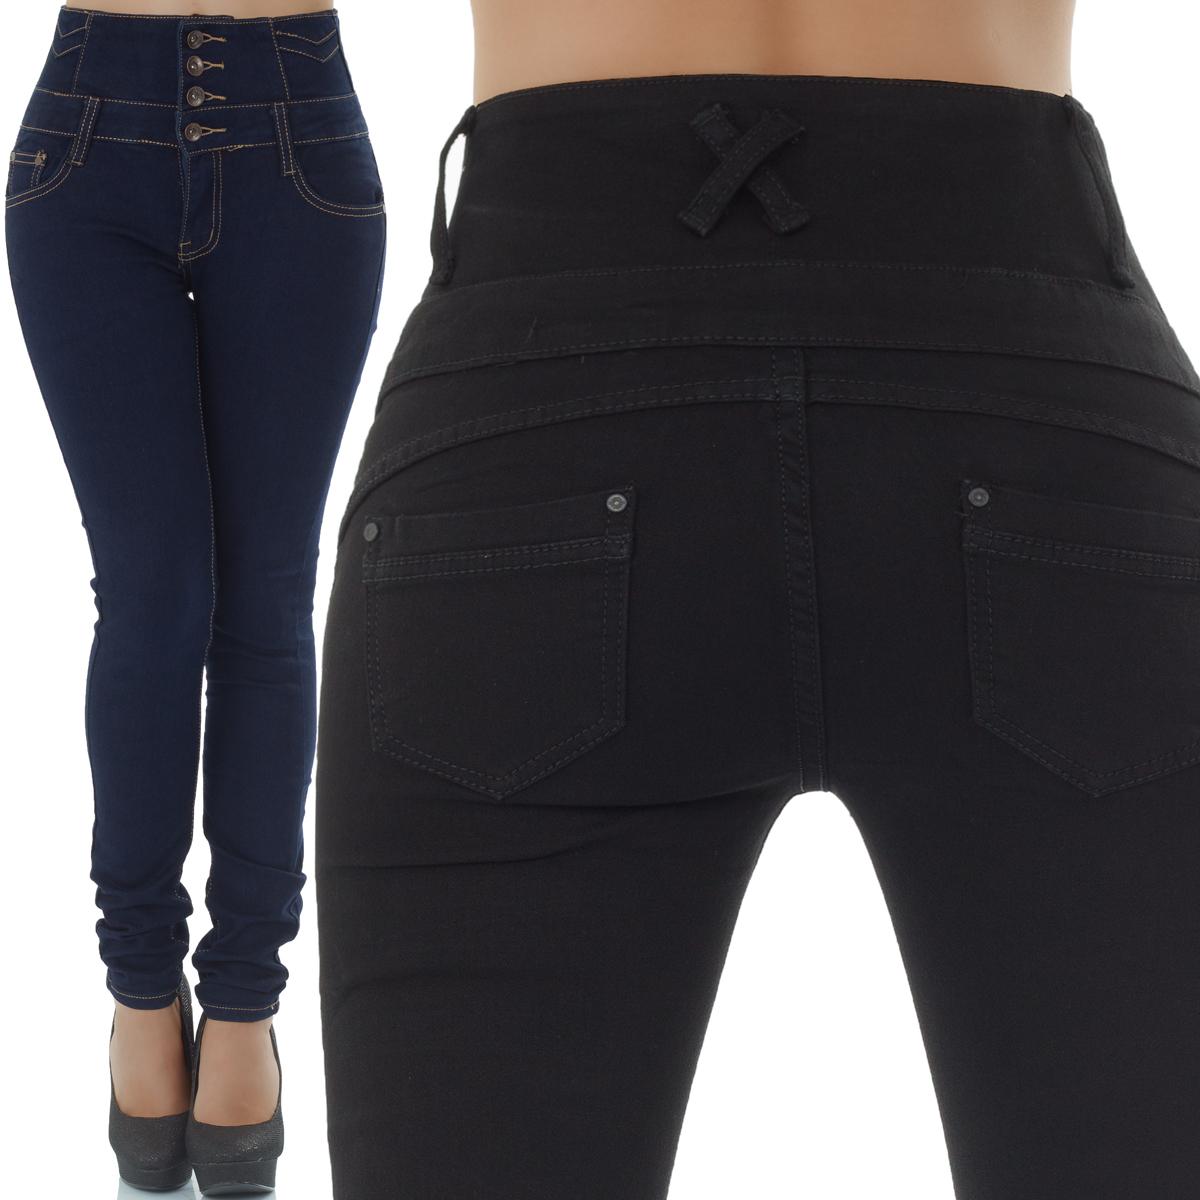 Malucas Damen Jeans High Waist Hose Röhrenjeans Röhrenhose Röhre Stretch Denim